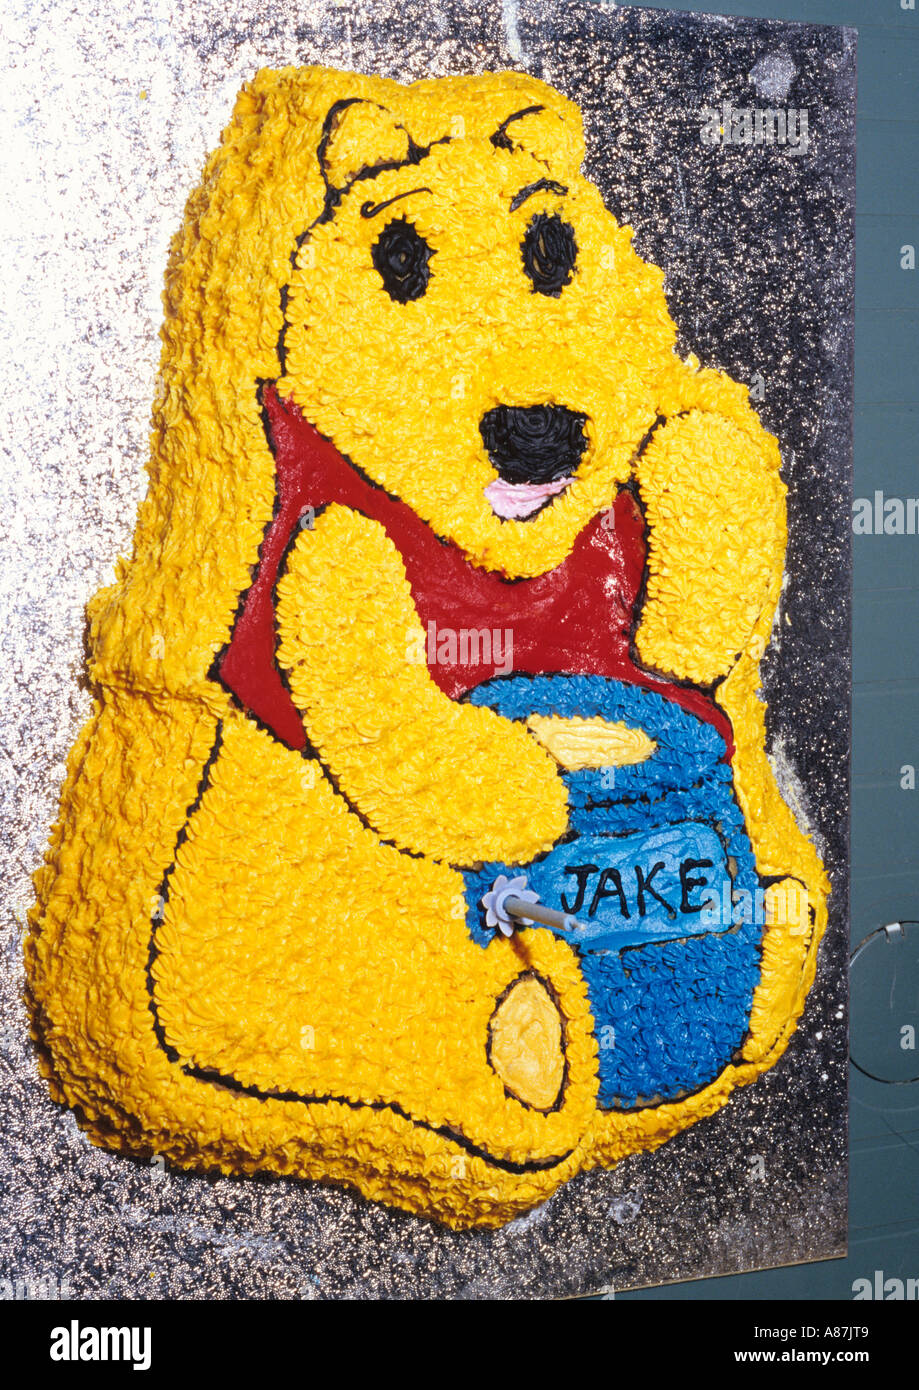 Stupendous Winnie The Pooh Birthday Cake In The Uk Stock Photo 6865160 Alamy Funny Birthday Cards Online Necthendildamsfinfo